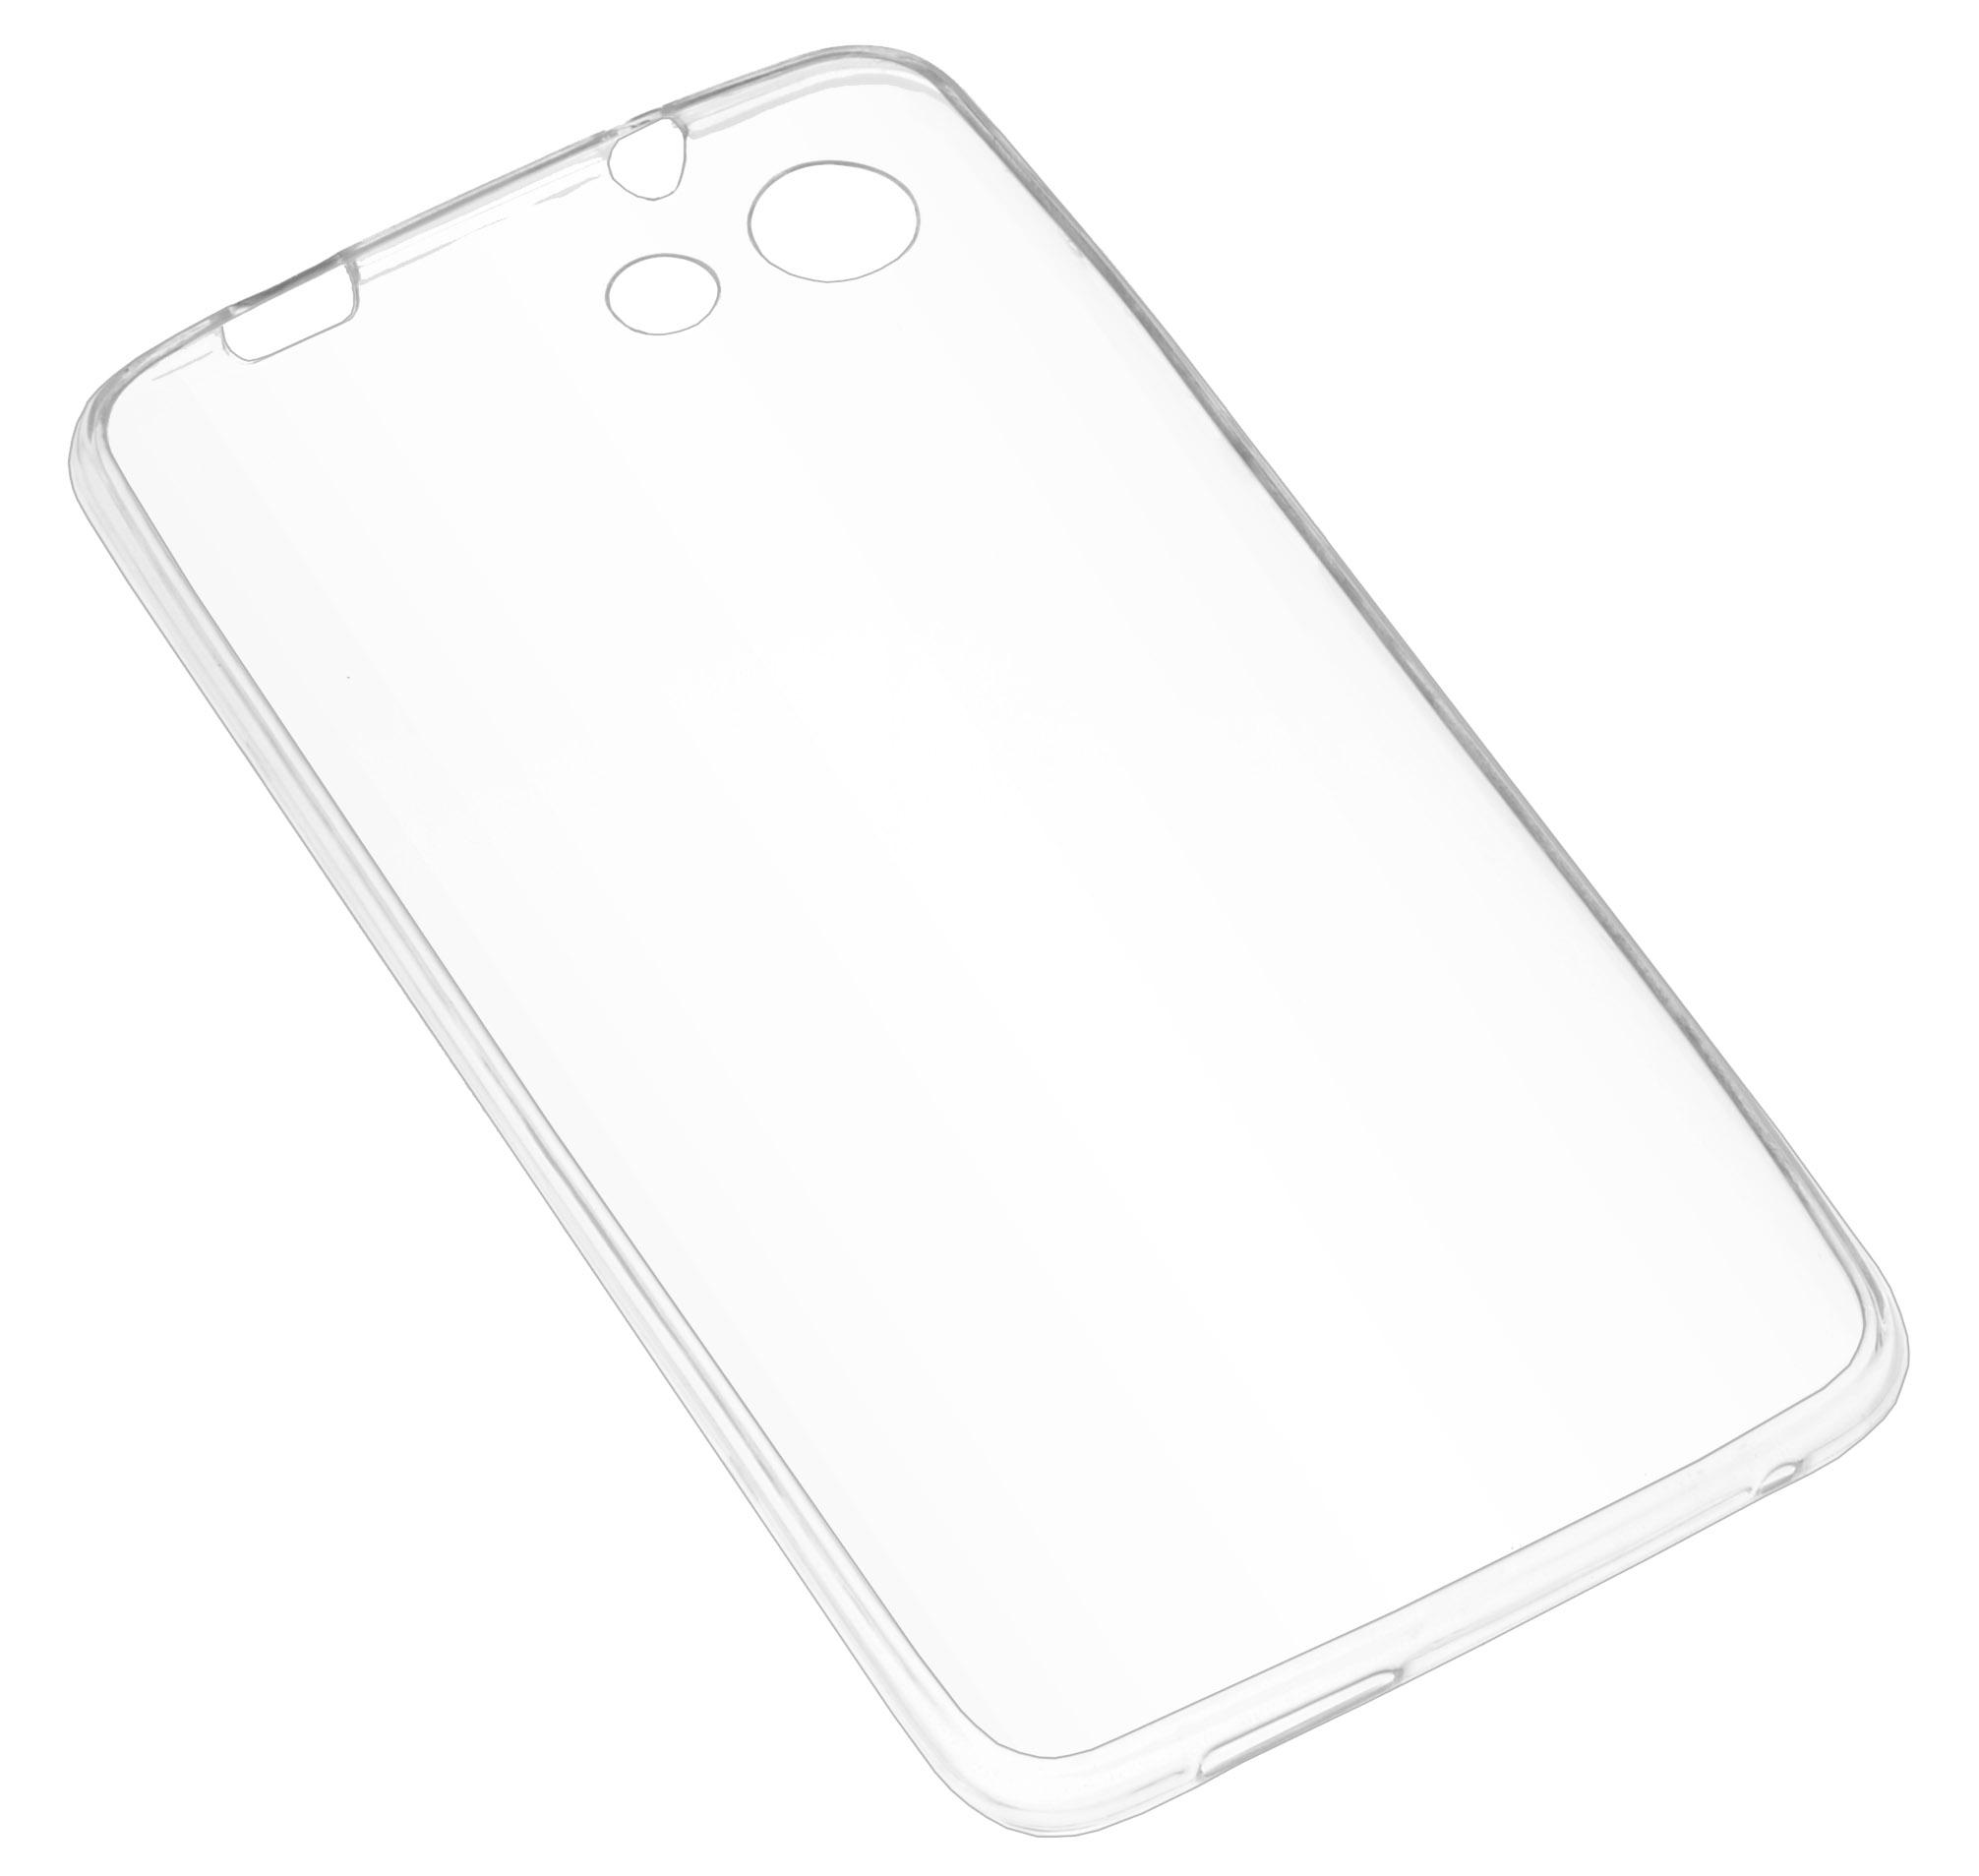 Чехол для сотового телефона skinBOX Slim Silicone, 4660041409468, прозрачный накладка skinbox slim silicone для xiaomi redmi 4x прозрачный